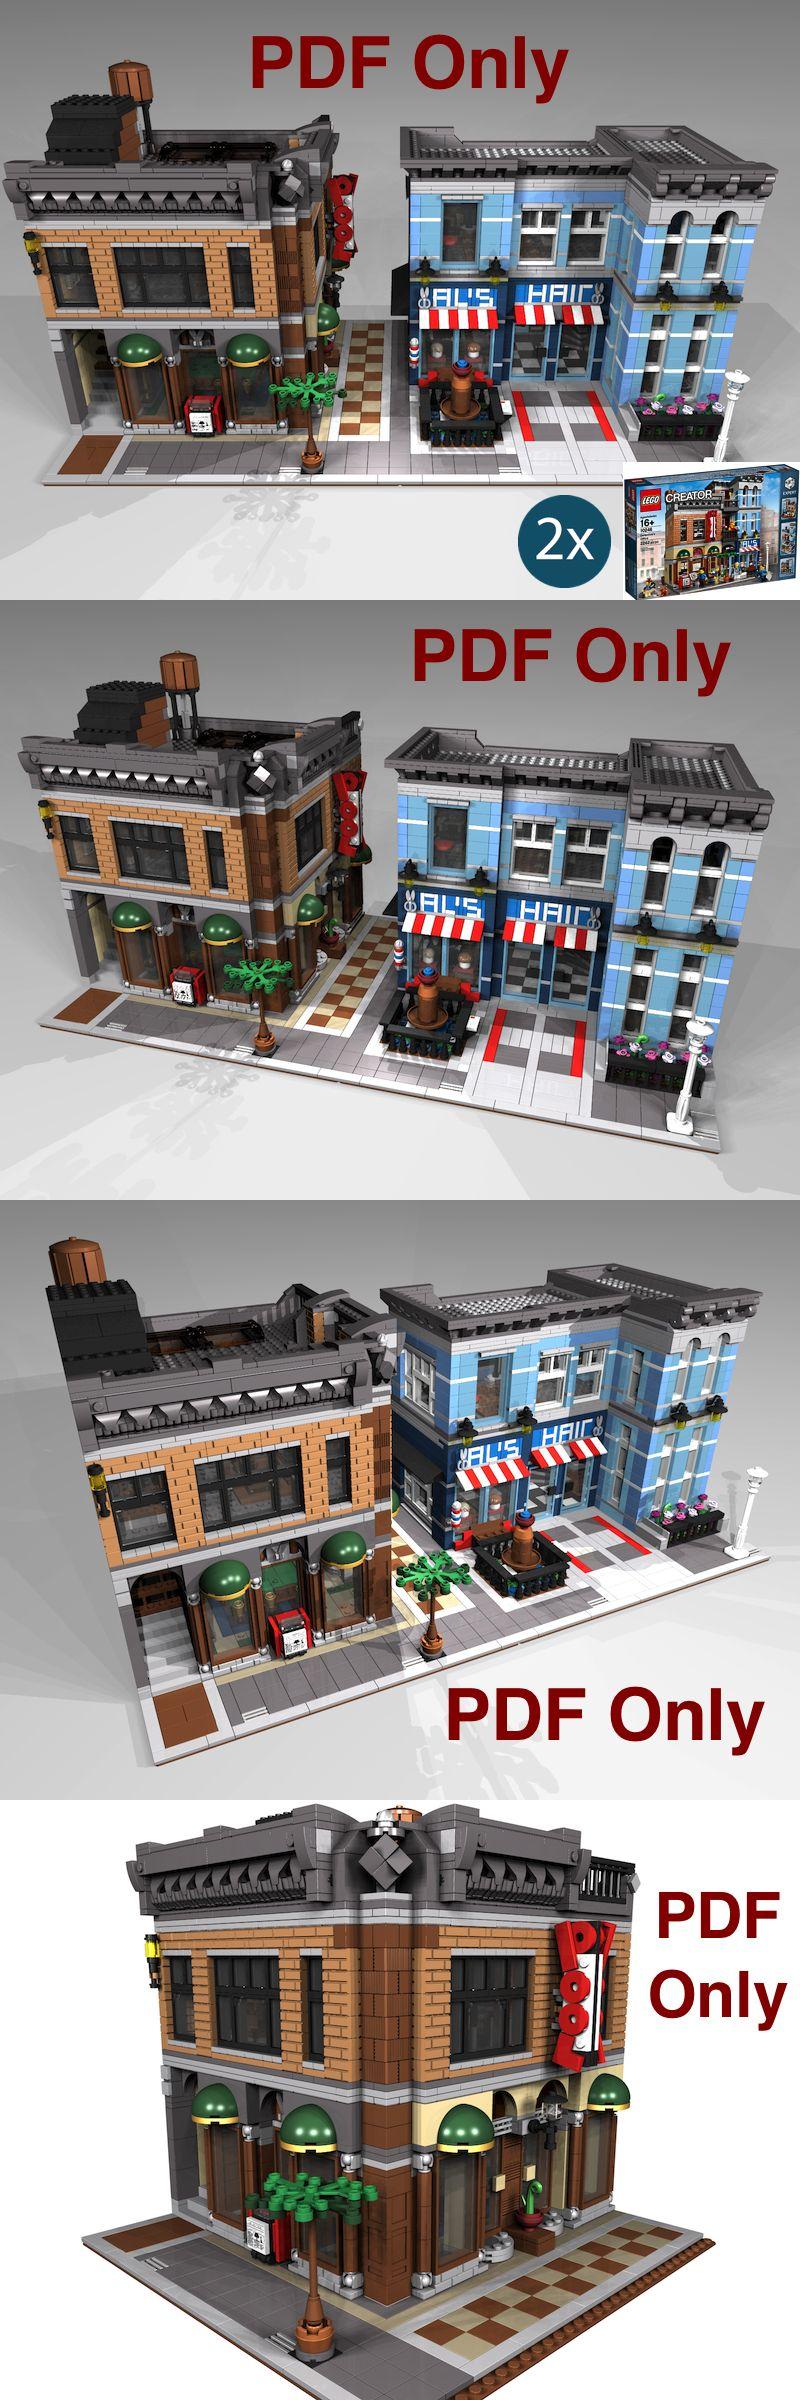 Lego Custom Modular Instructions Detective's Office